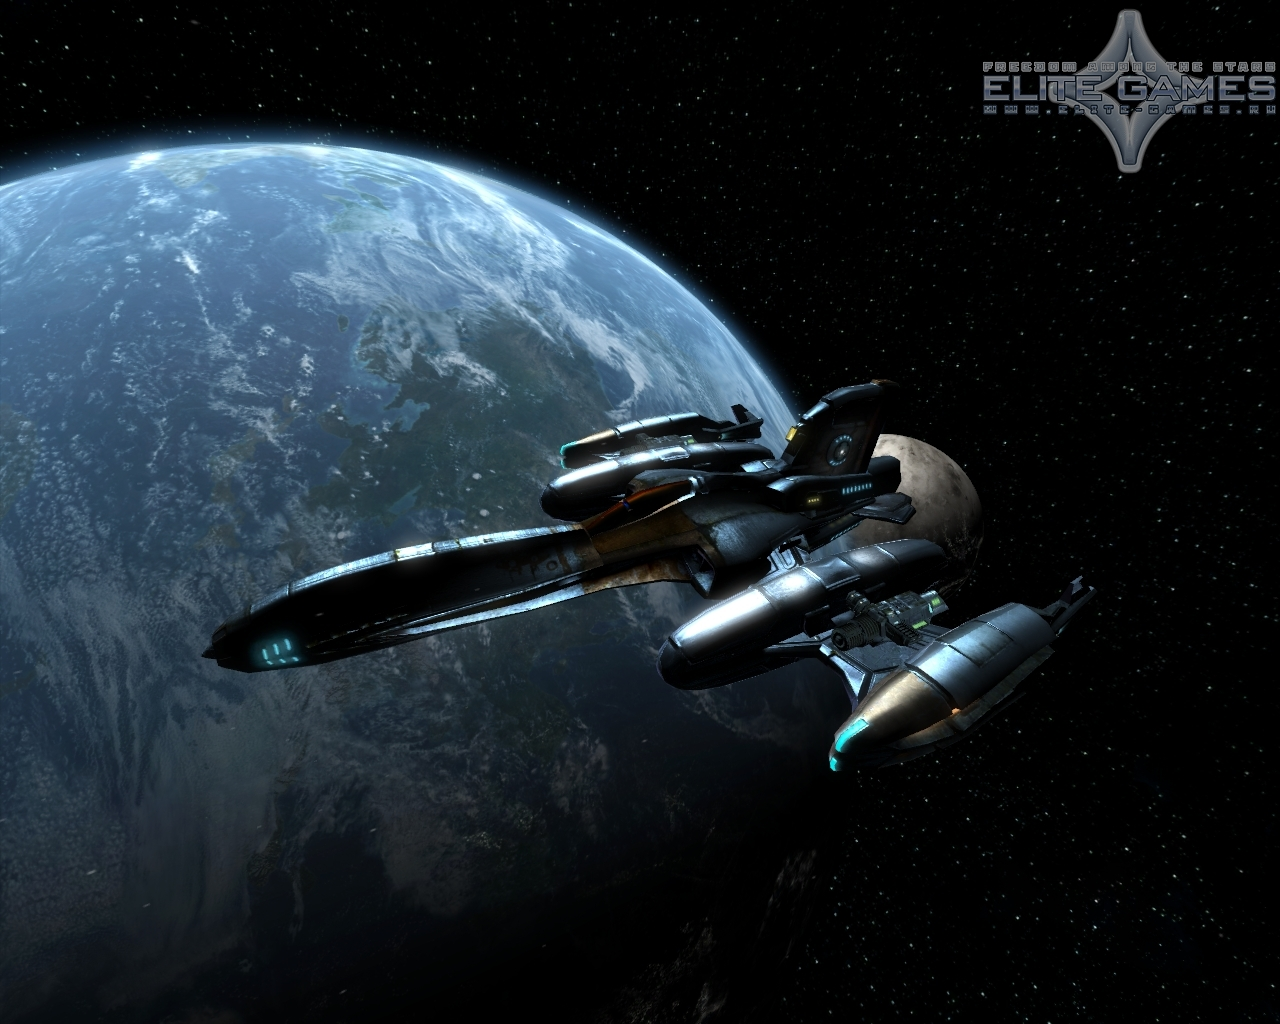 X3tc Plankton ArgonOTAS ships look like